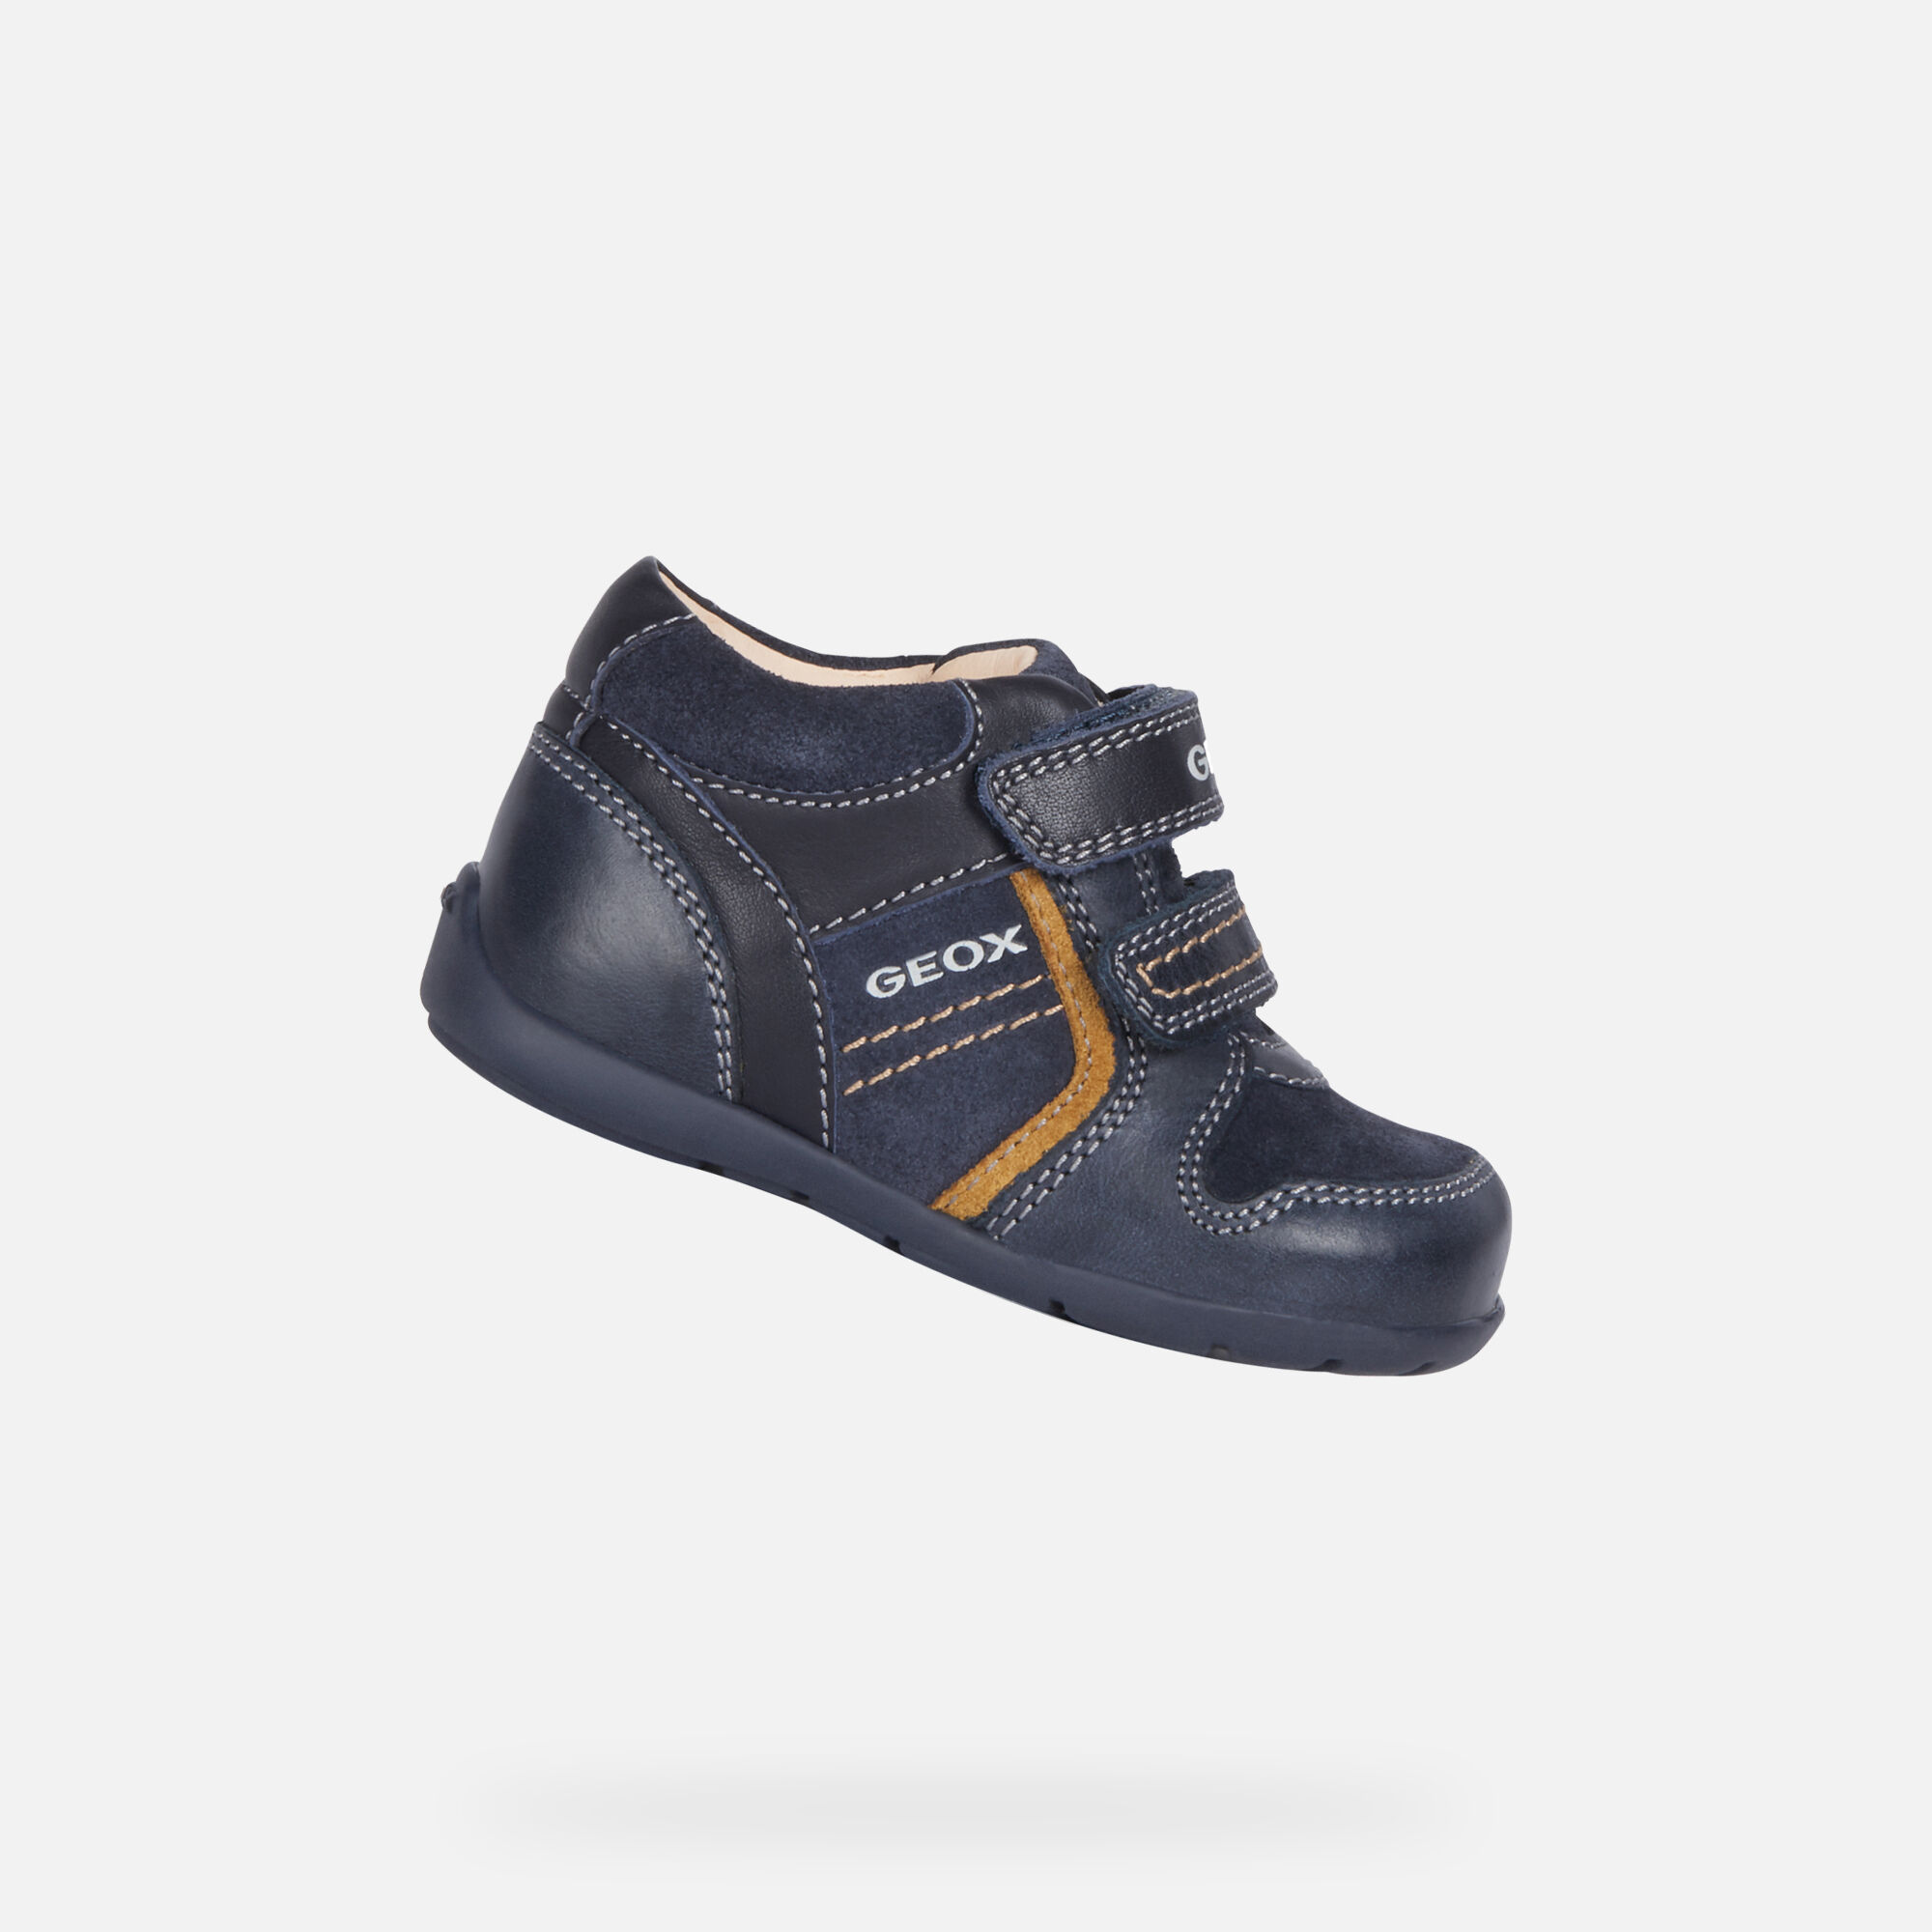 Geox KAYTAN Bébé Garçon Chaussures premiers pas Bleue | Geox®